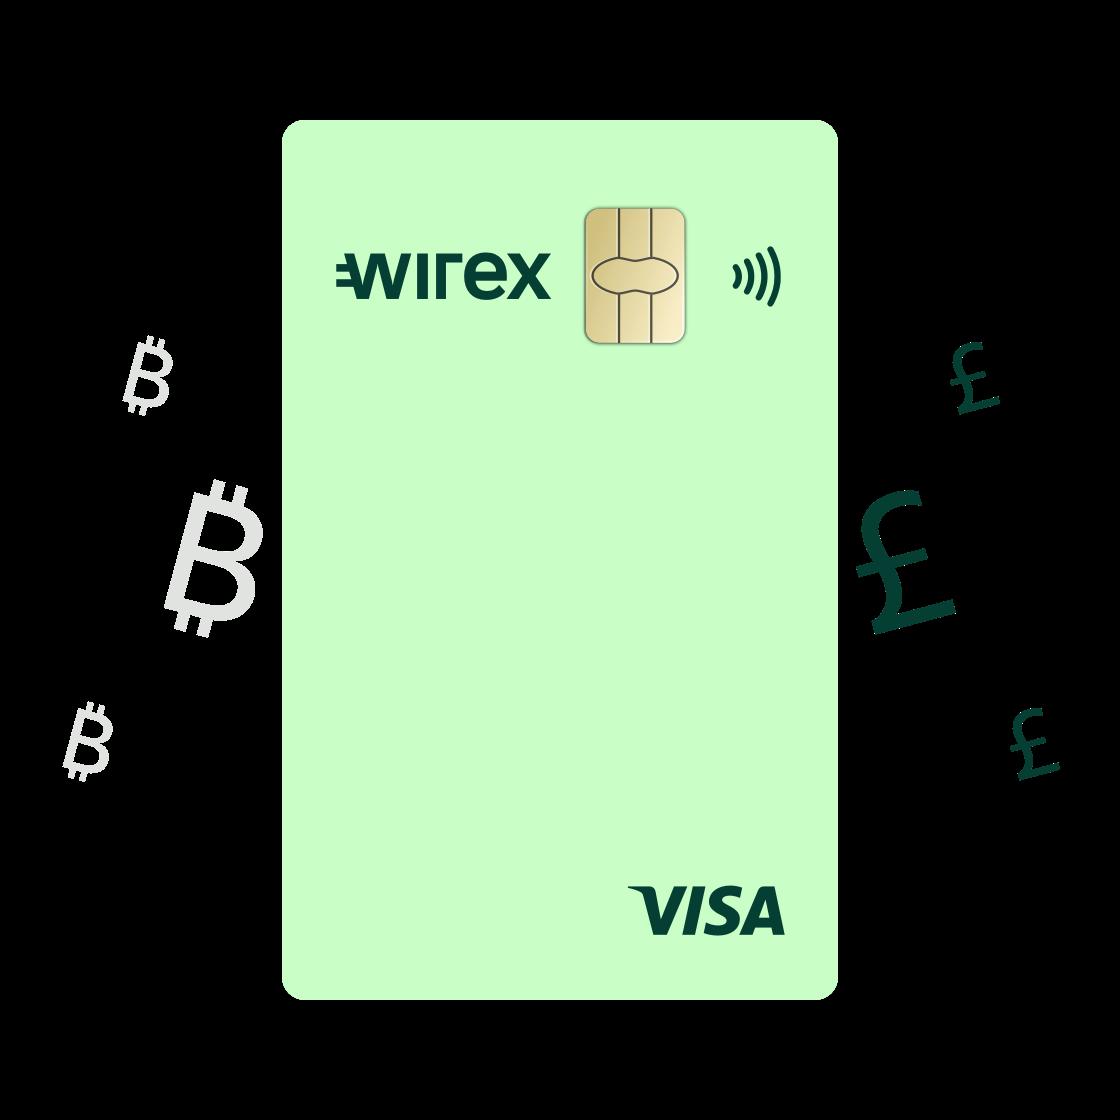 a-world-exchange